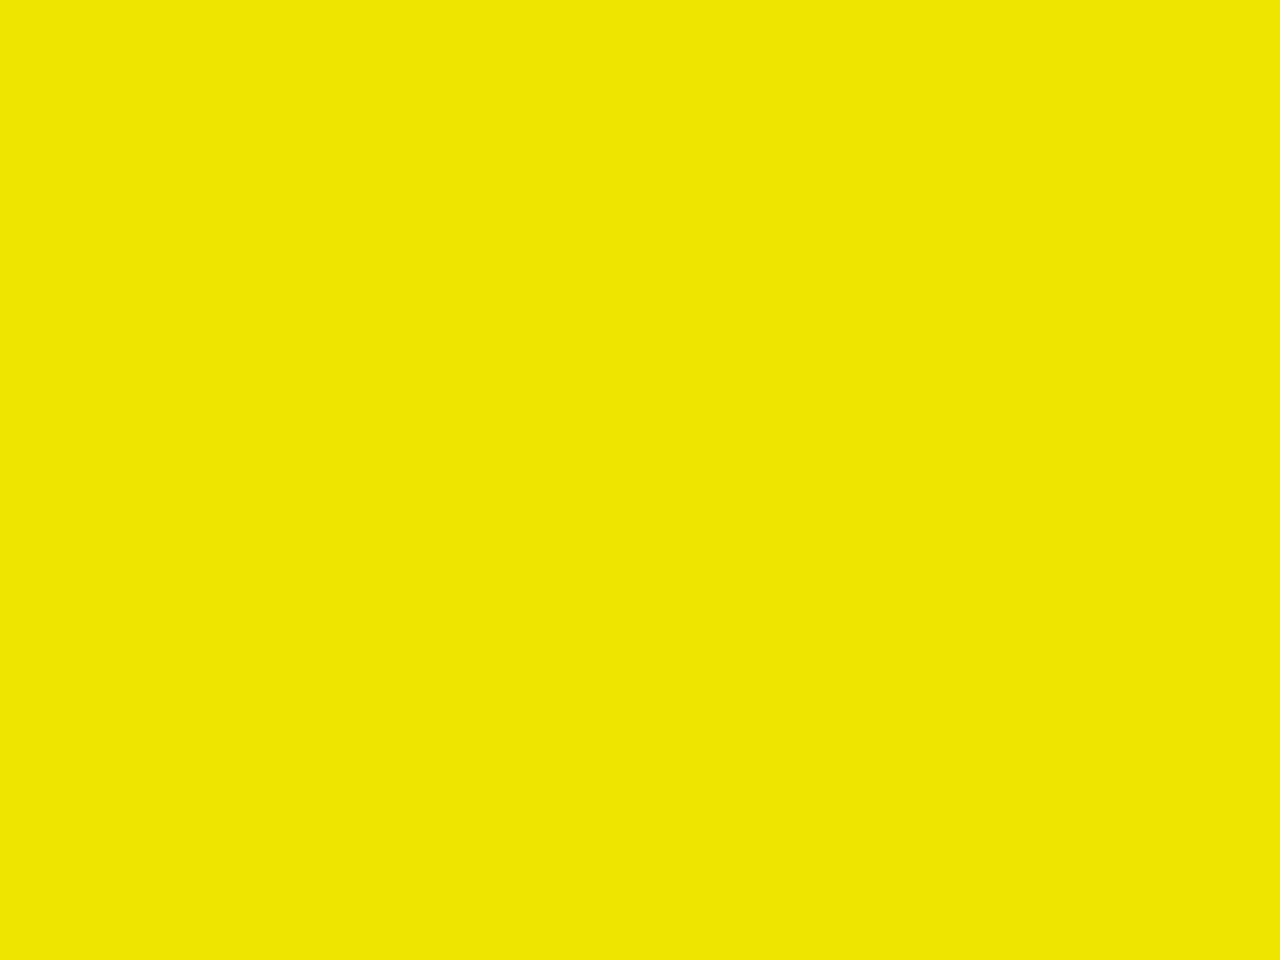 1280x960 Titanium Yellow Solid Color Background